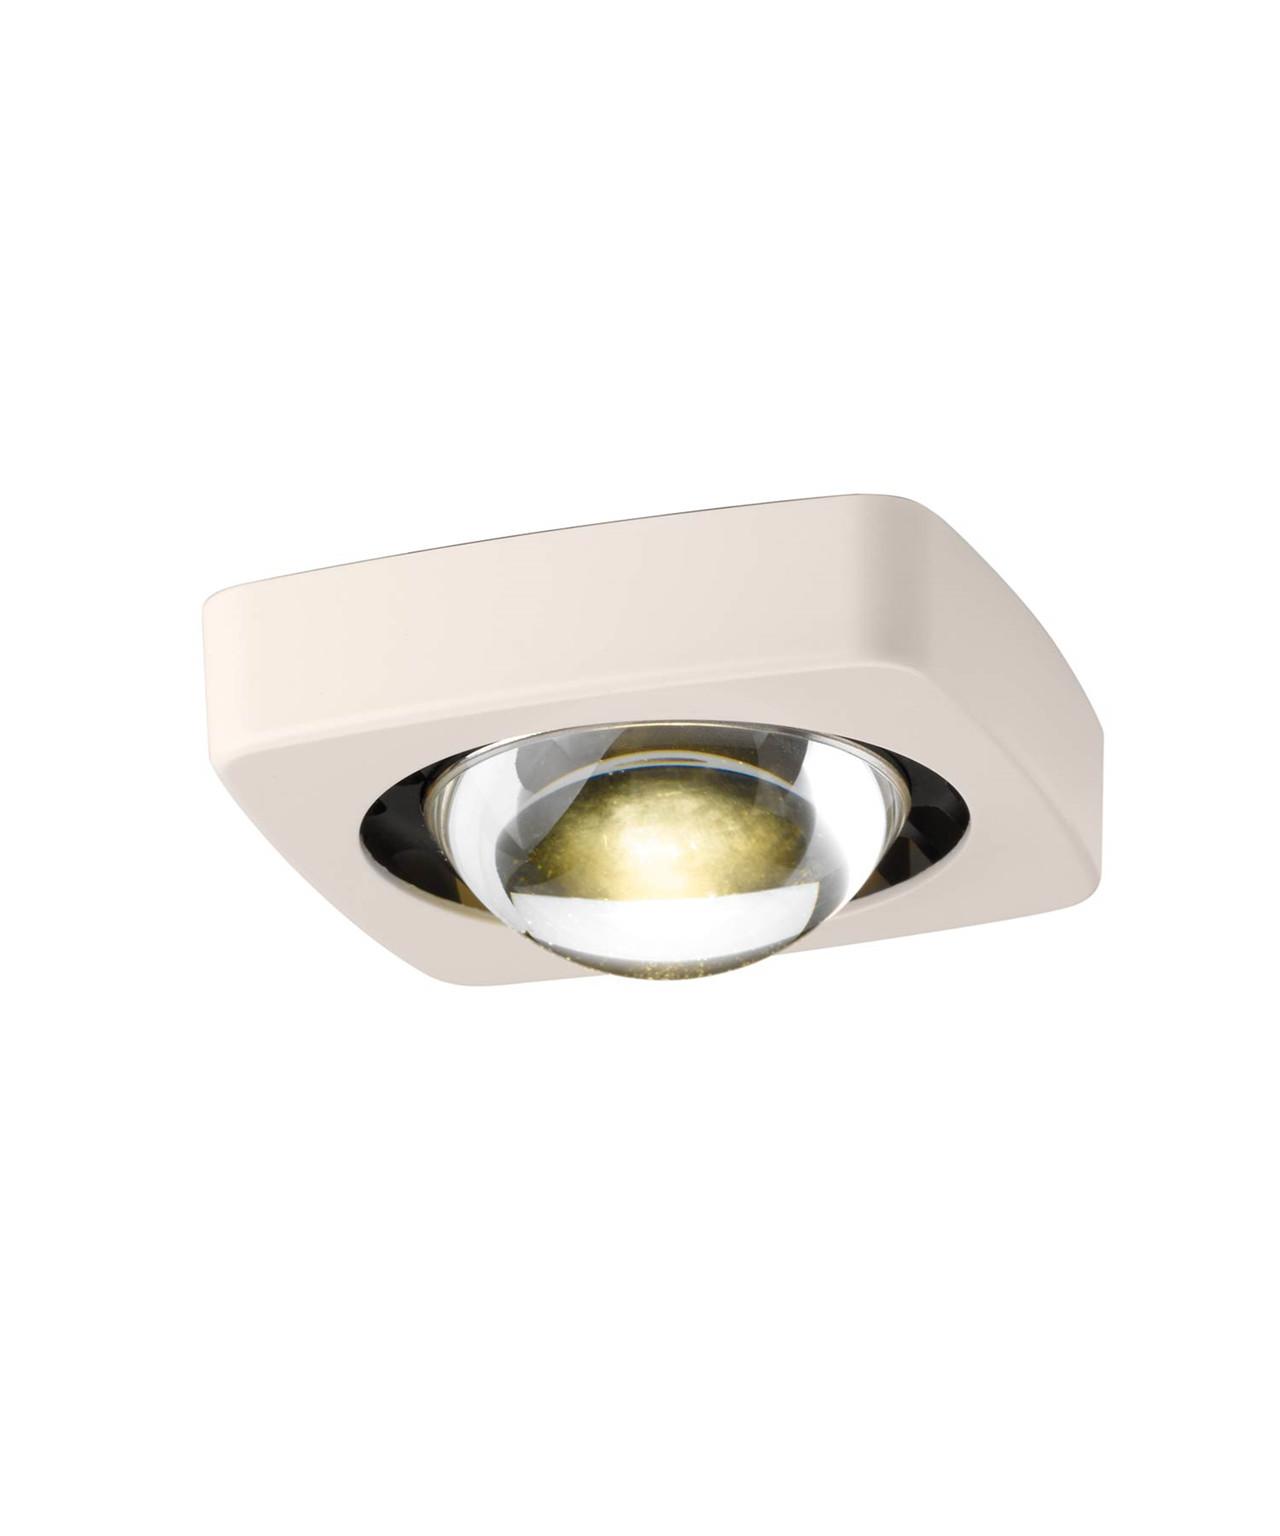 Kelveen Loftlampe/Væglampe Monted 90° - Oligo thumbnail